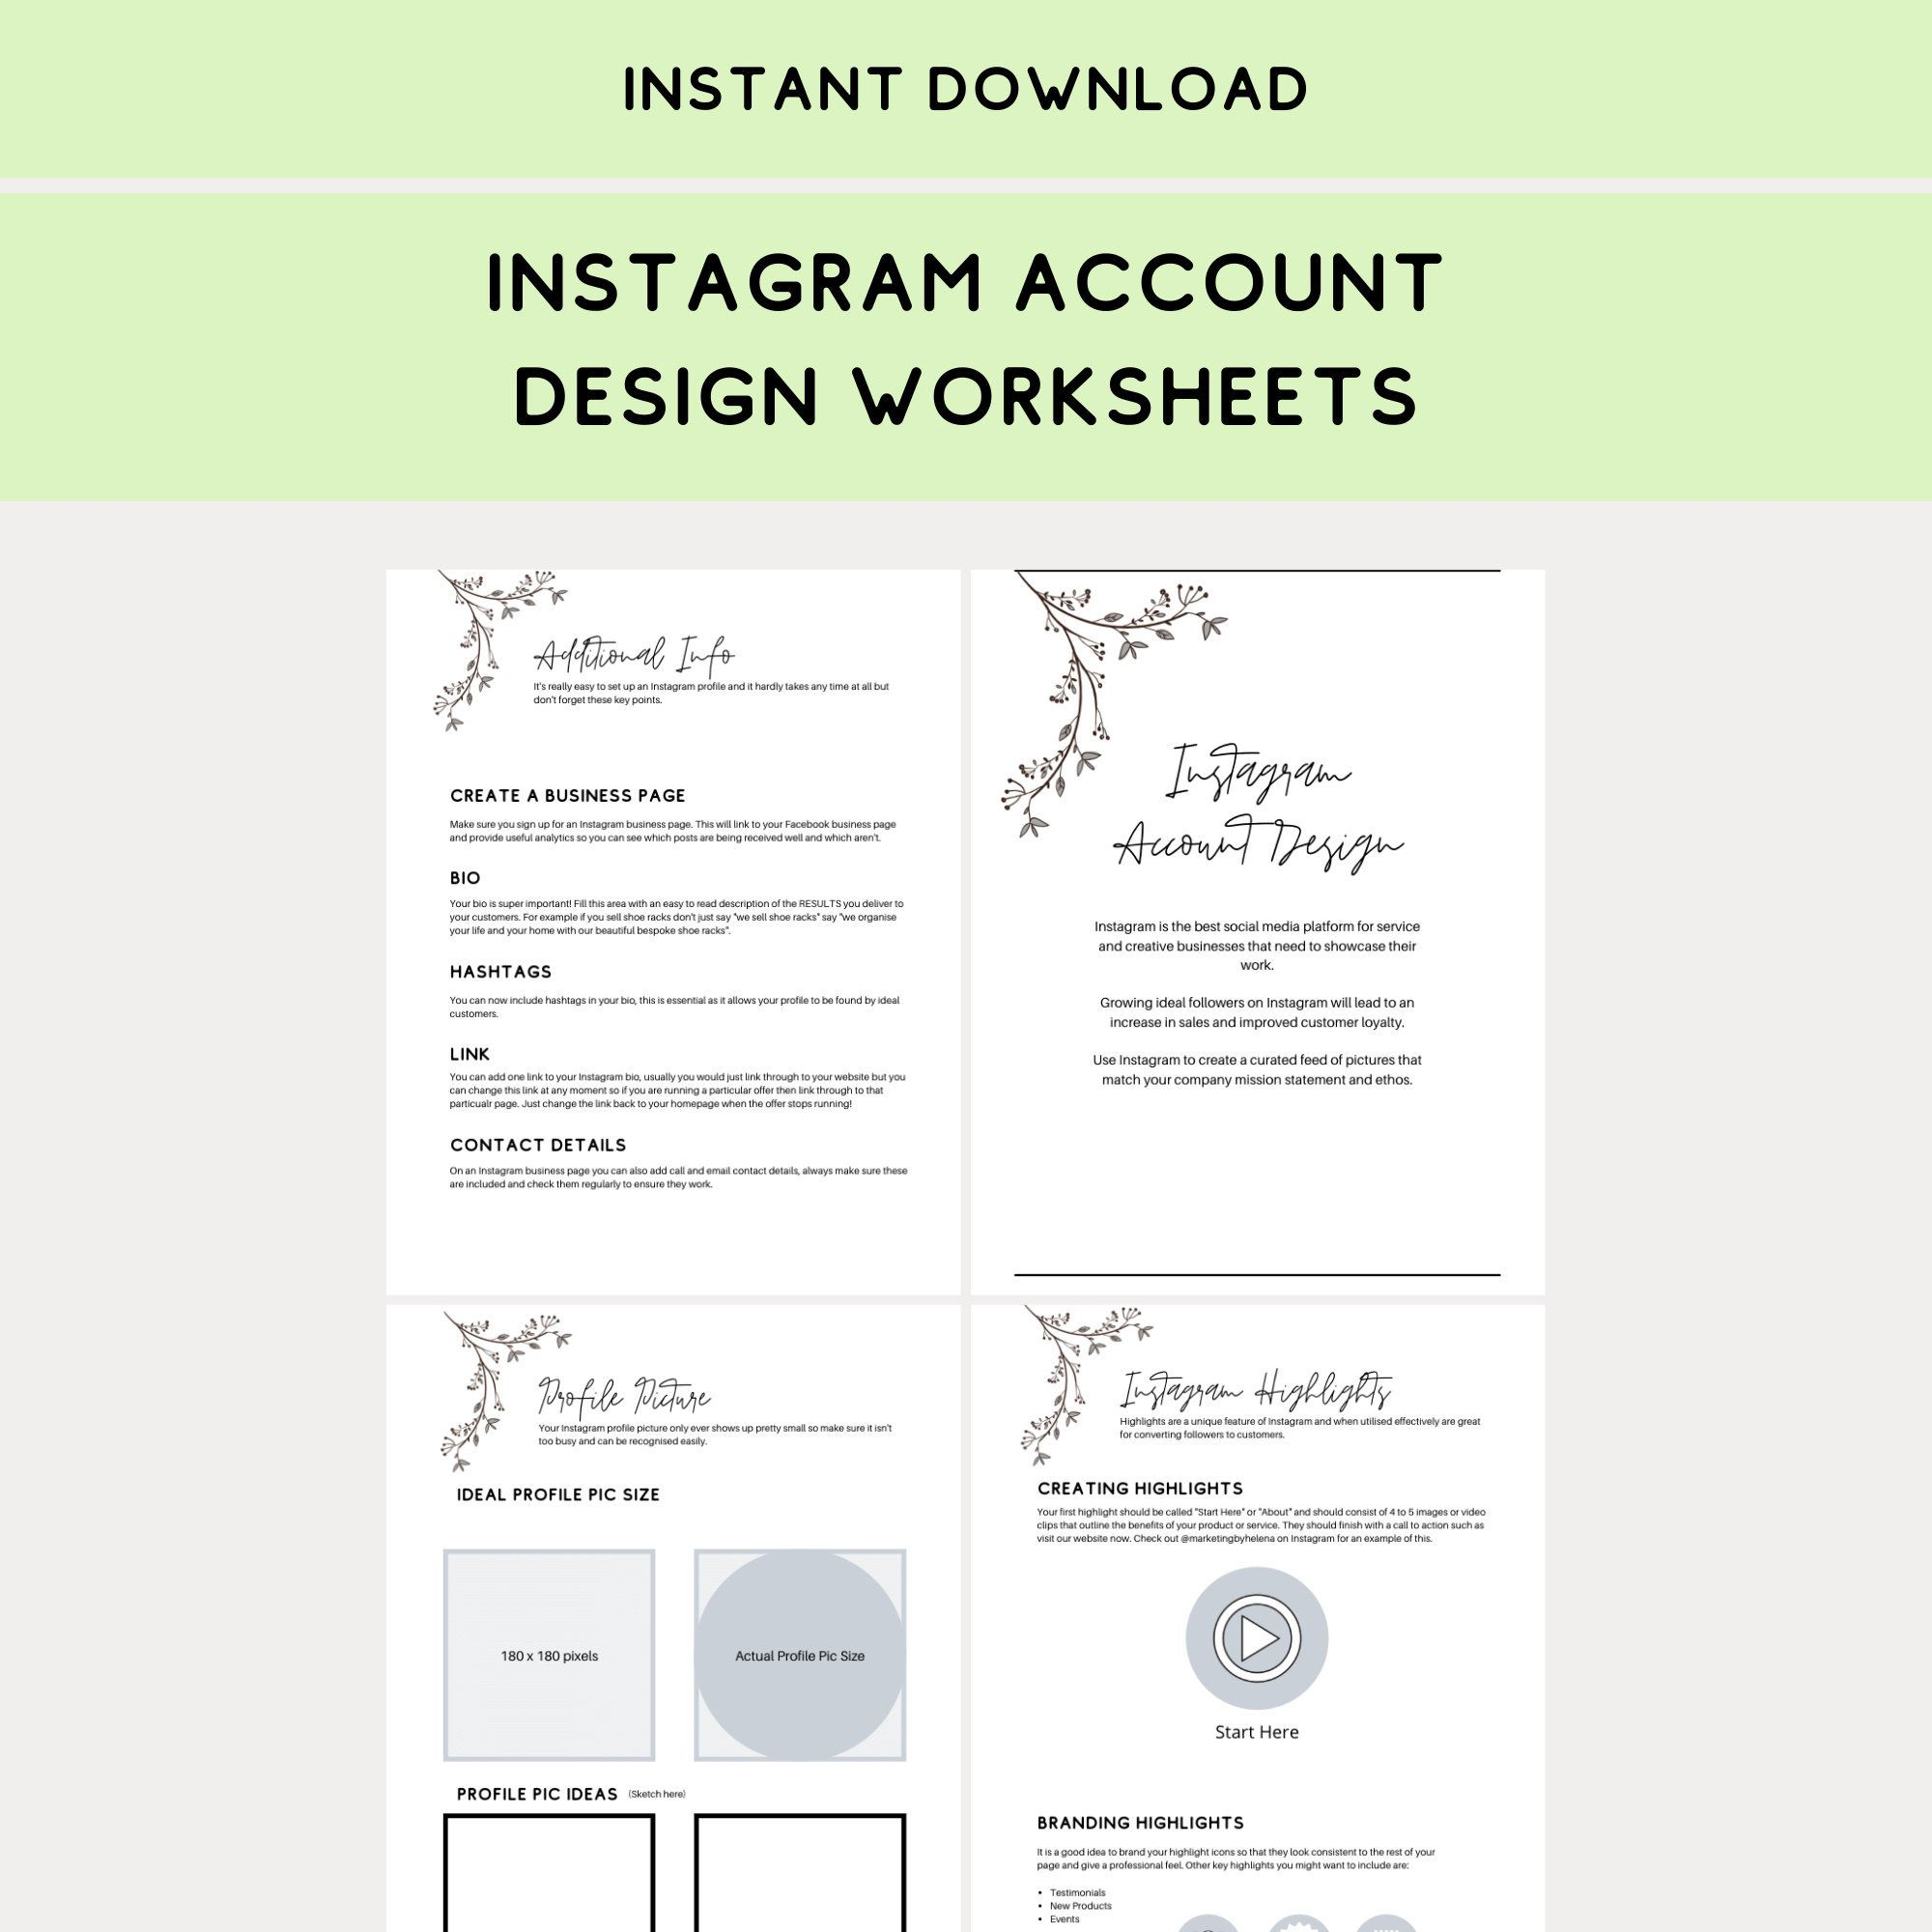 Instagram Account Design Worksheets